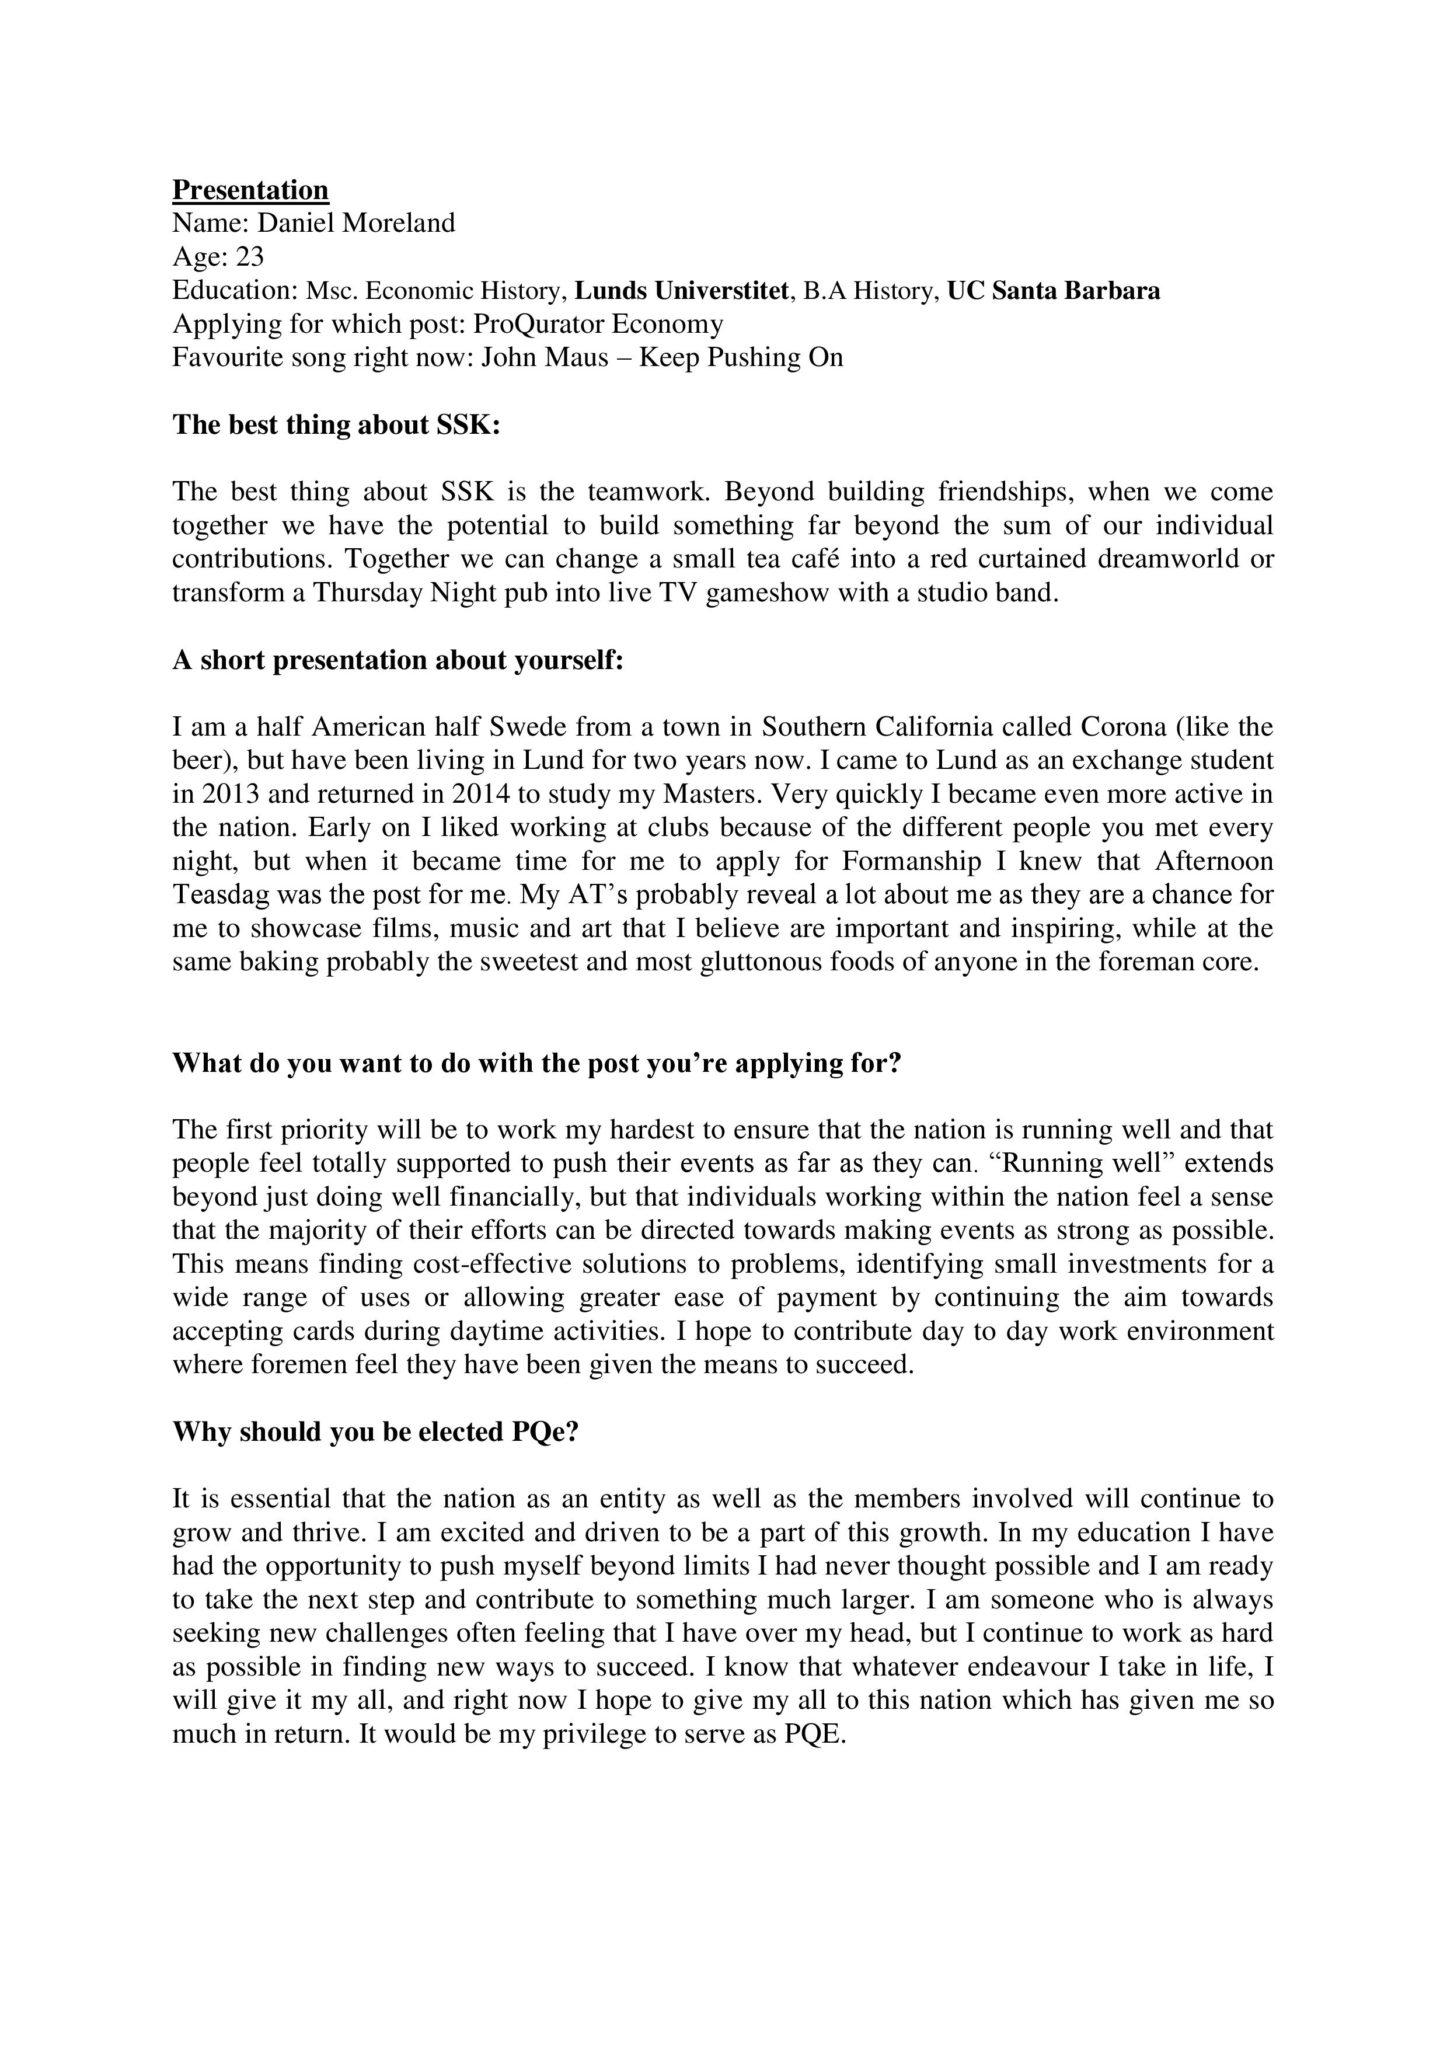 Daniel Moreland PQEPresentation-page-002